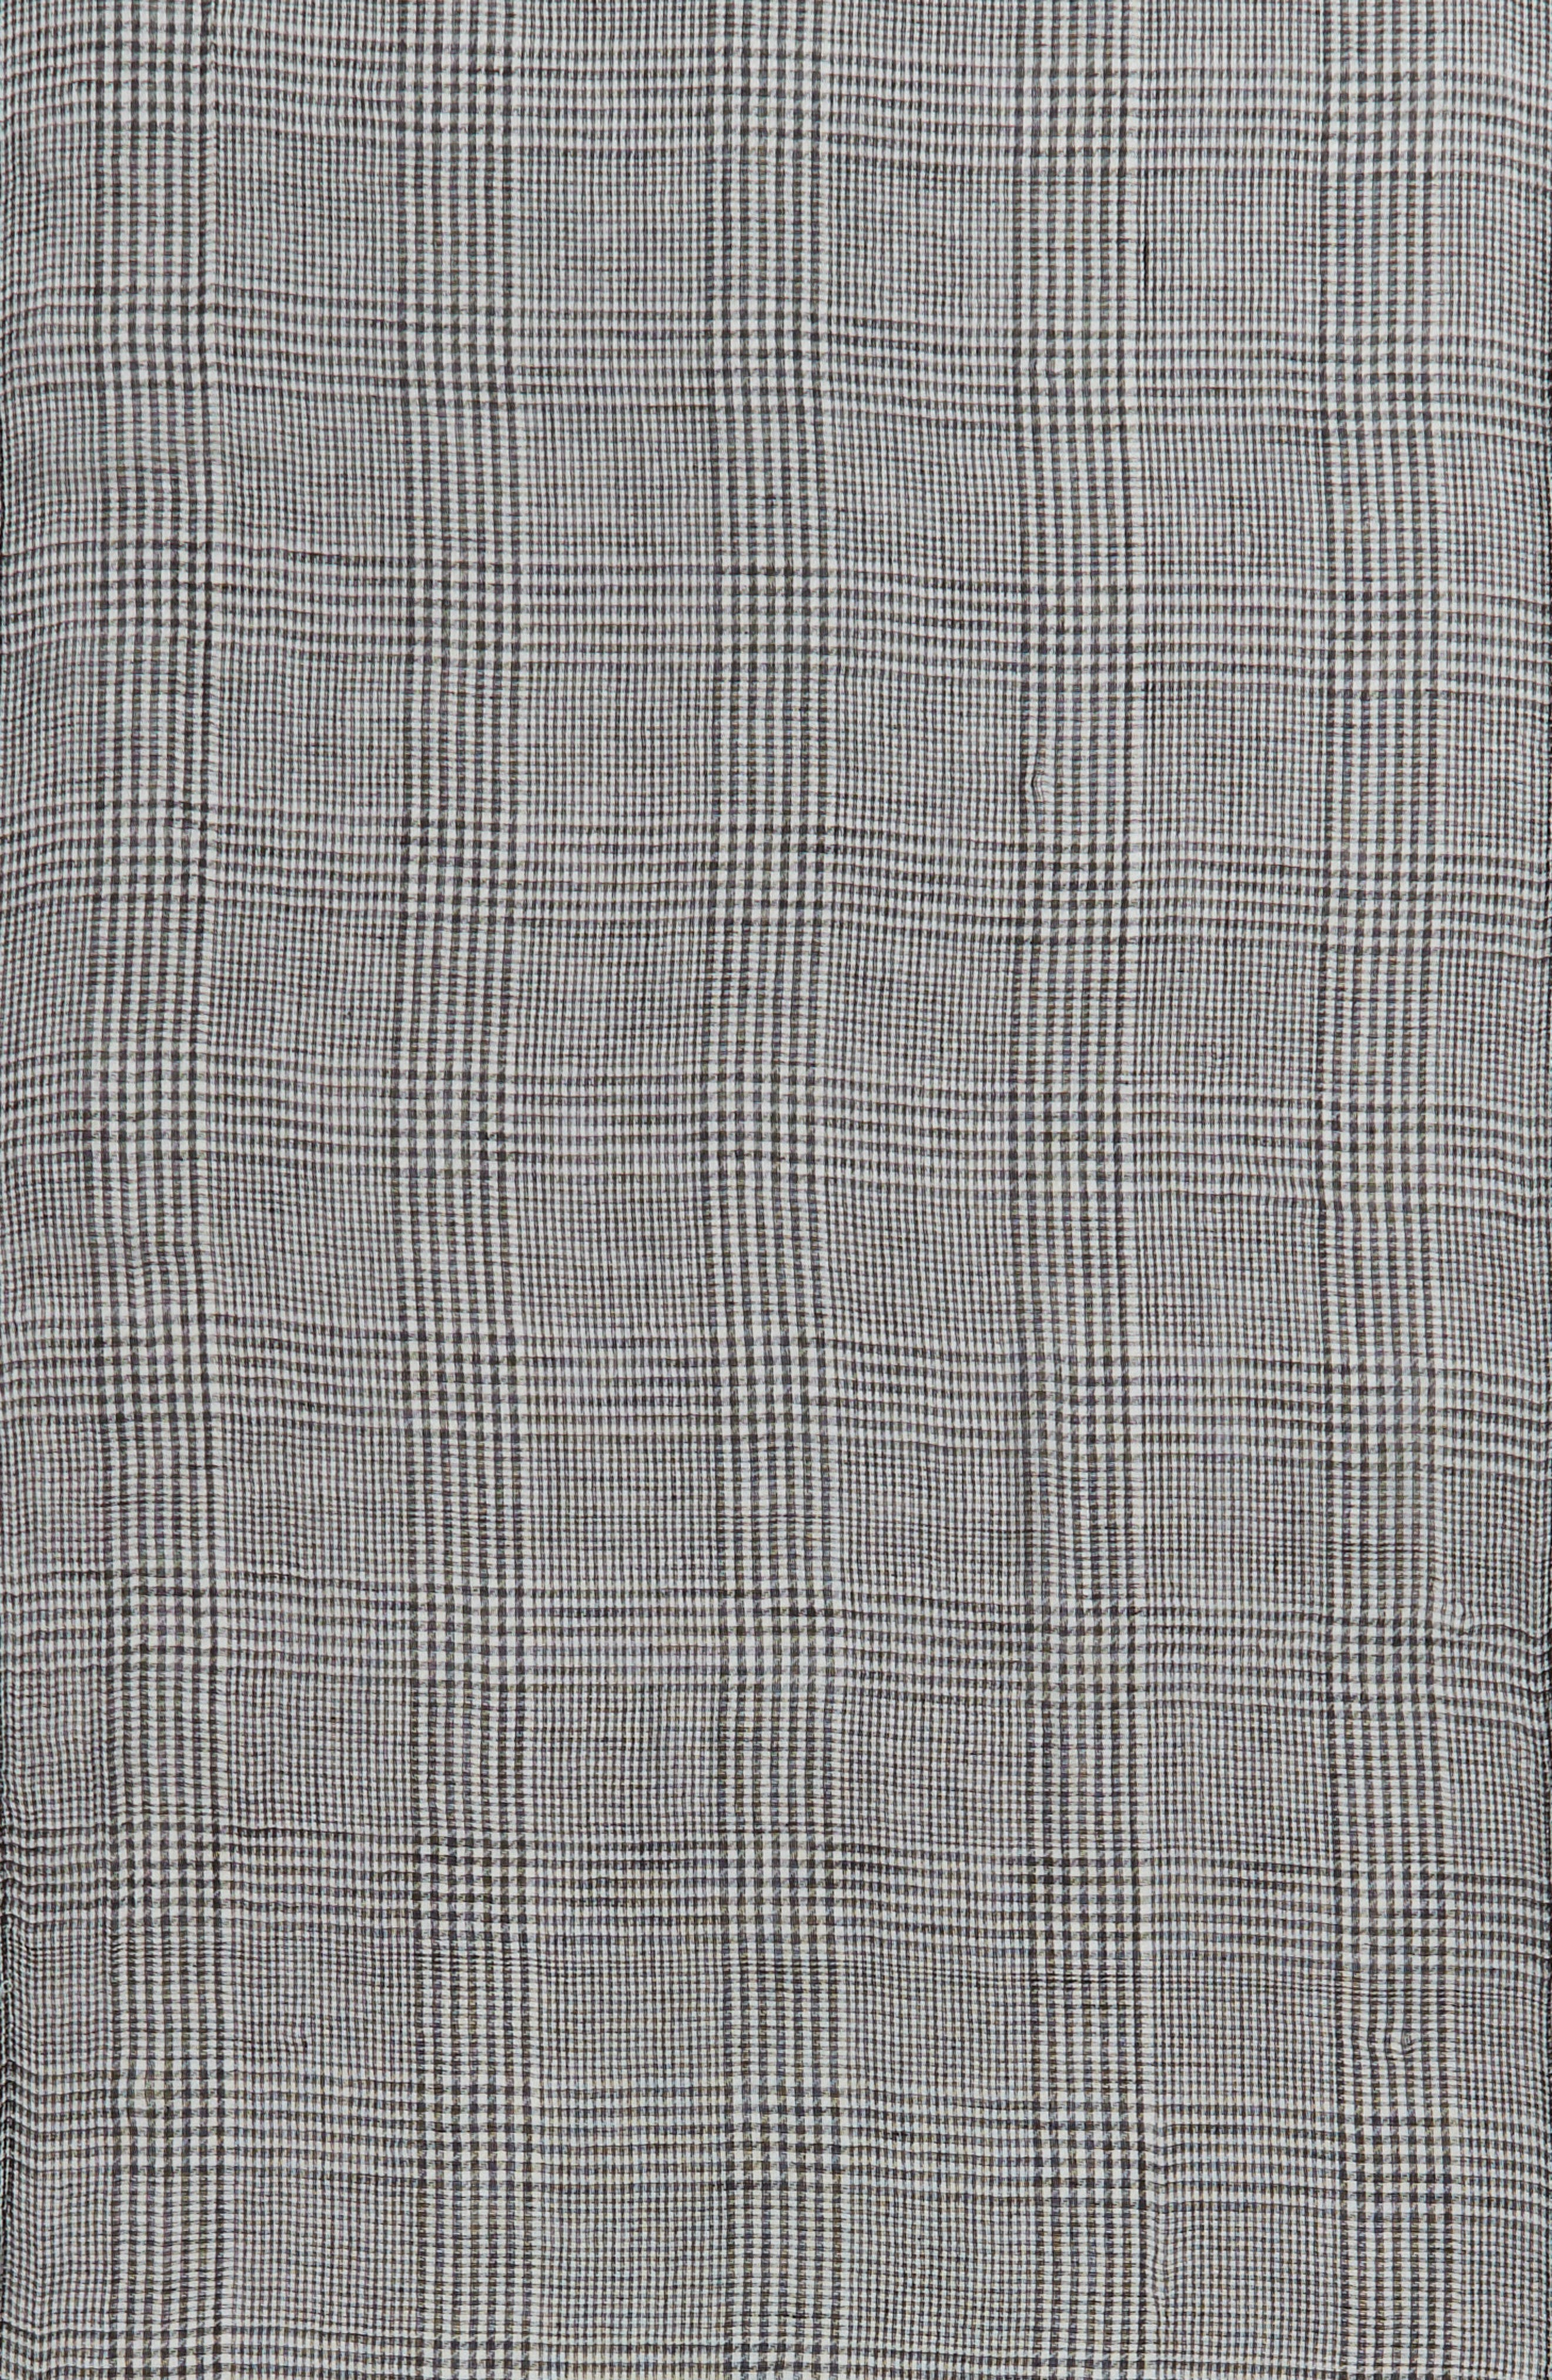 Menswear Plaid Oblong Scarf,                             Alternate thumbnail 4, color,                             020